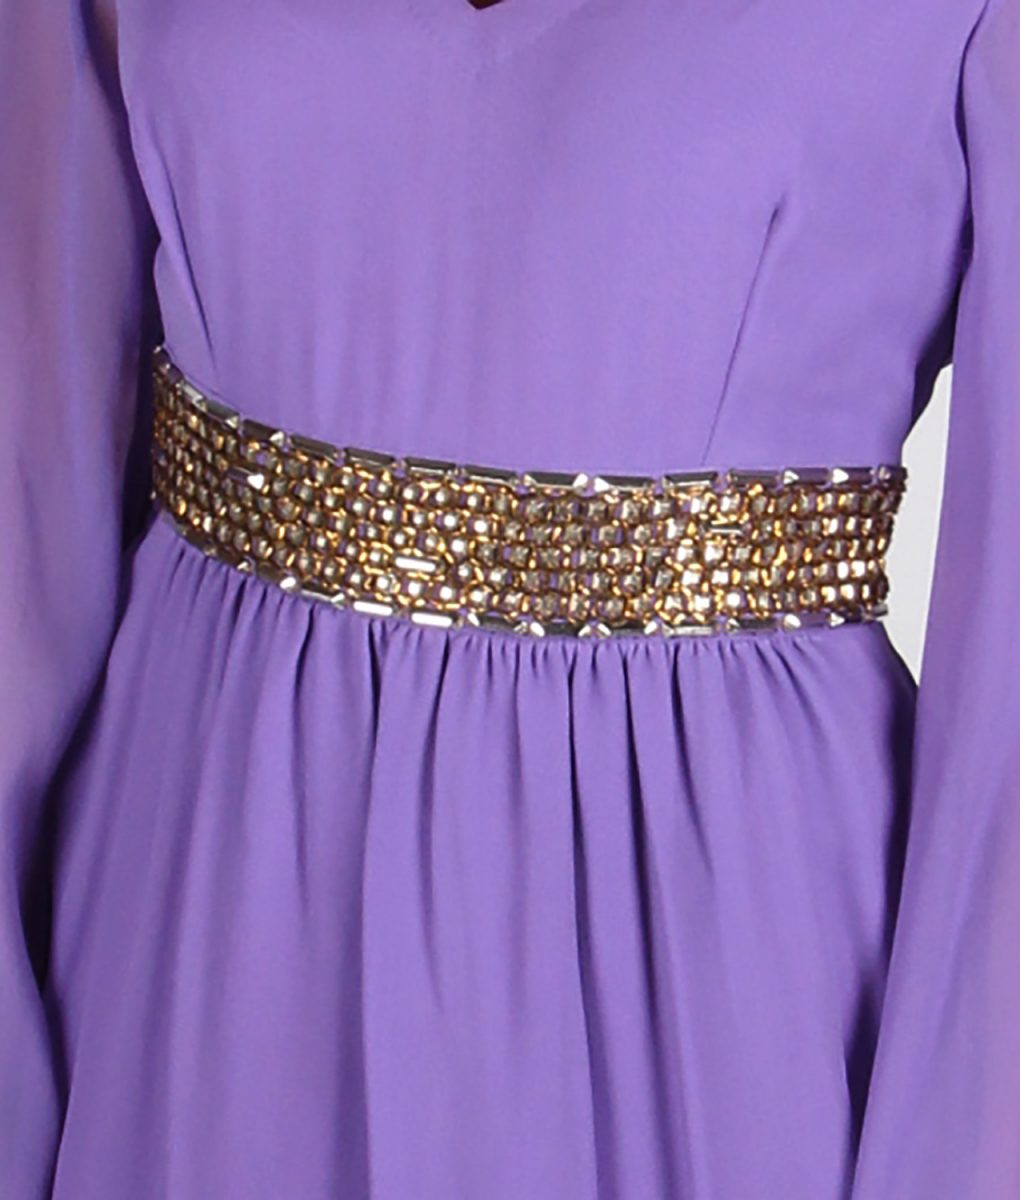 purpledetail